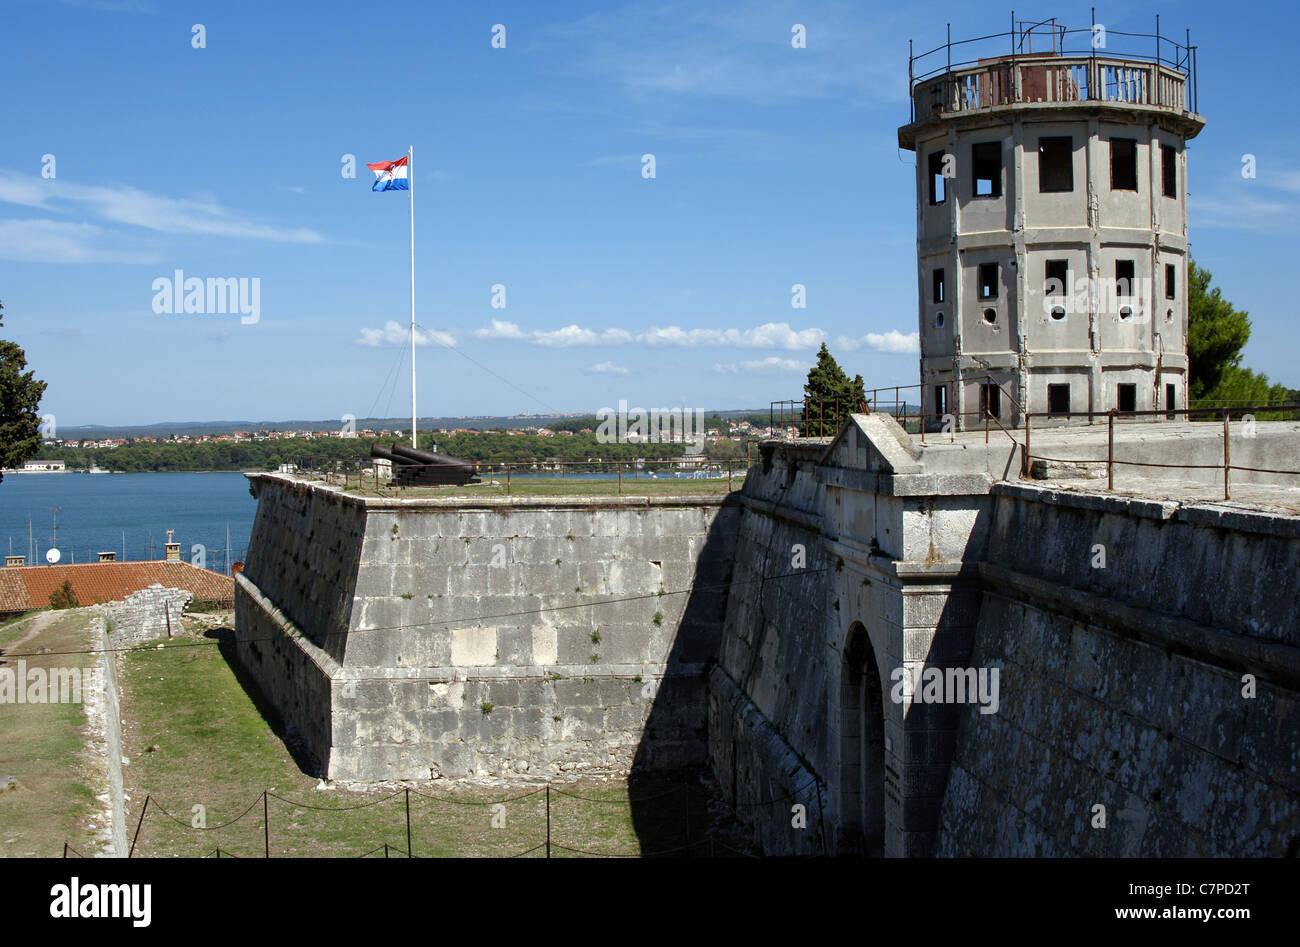 Kroatien. Pula. Venezianische Zitadelle. 17. Jahrhundert. Stockbild